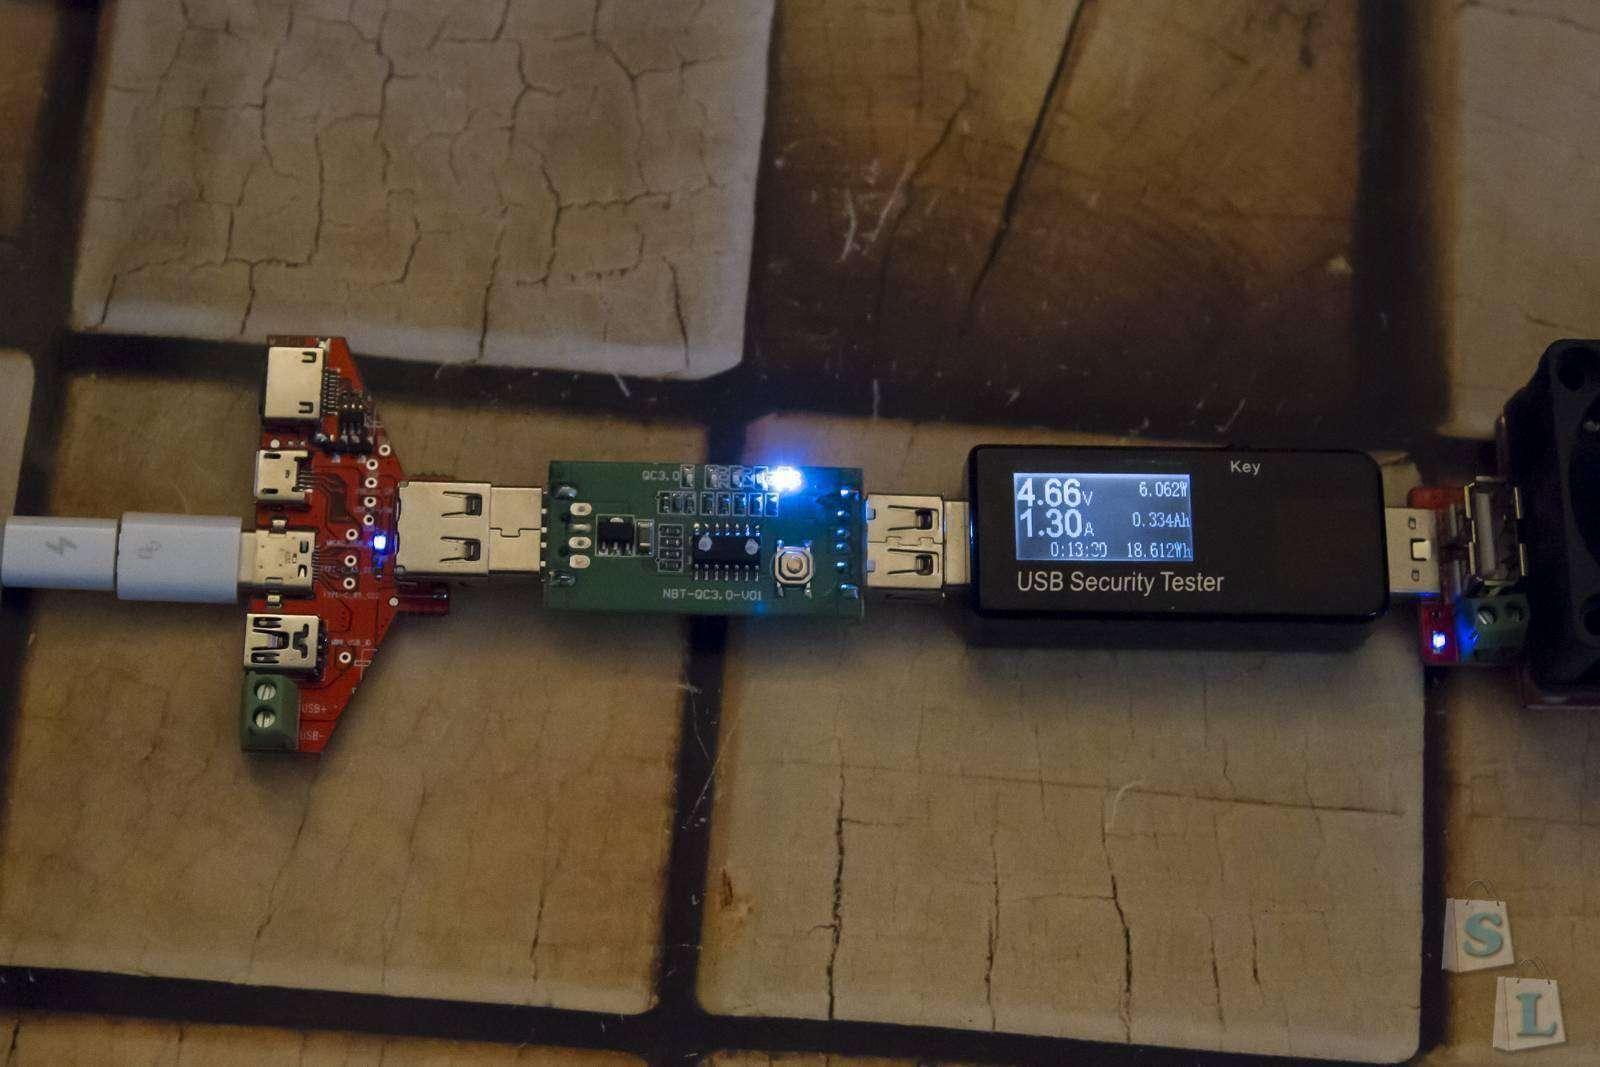 GearBest: Обзор и тестирование павербанка Xiaomi Mi Pro 10000mAh Type-C